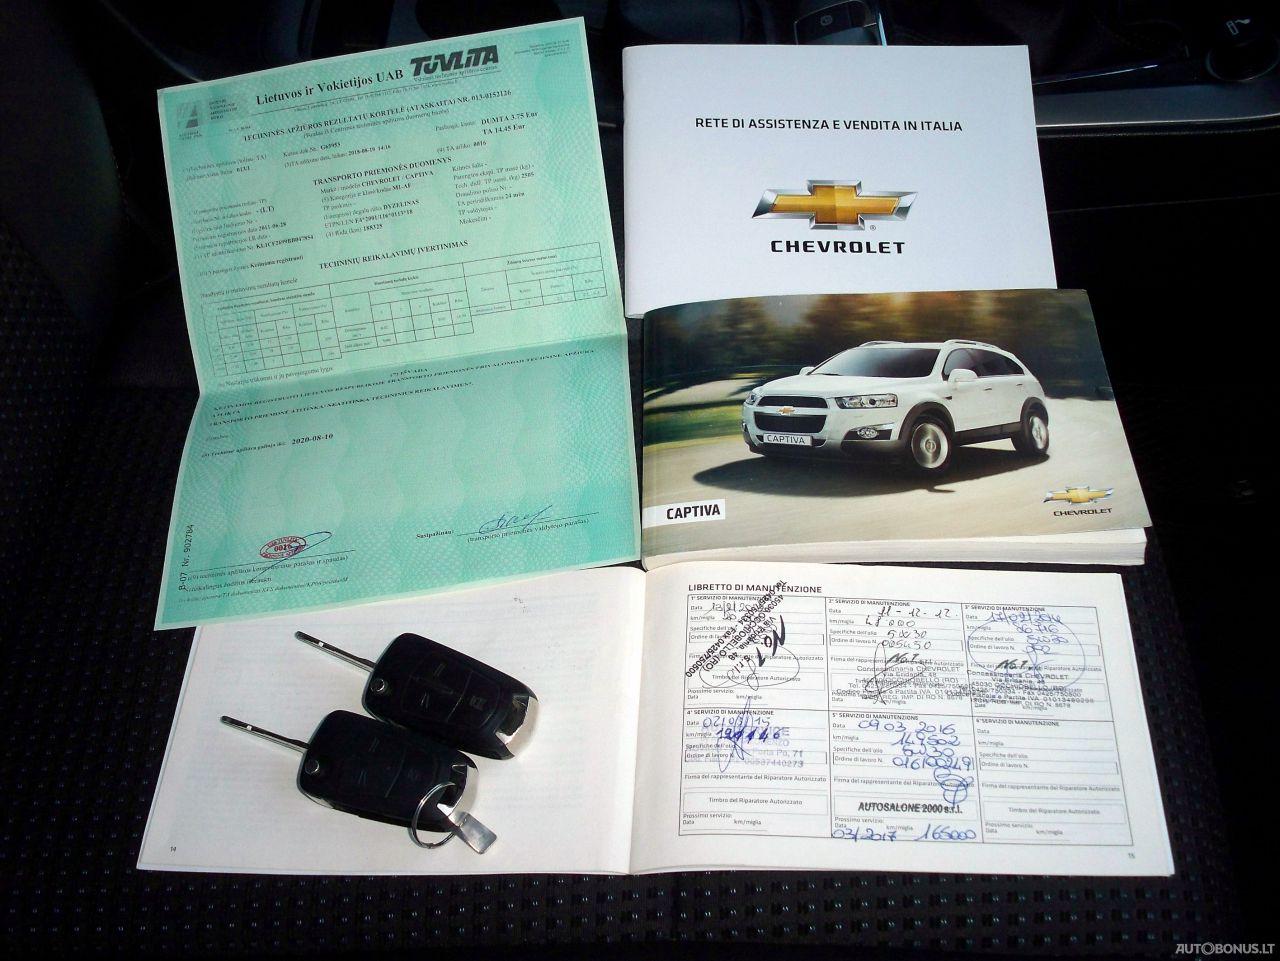 Chevrolet Captiva, Visureigis, 2011-12 | 22